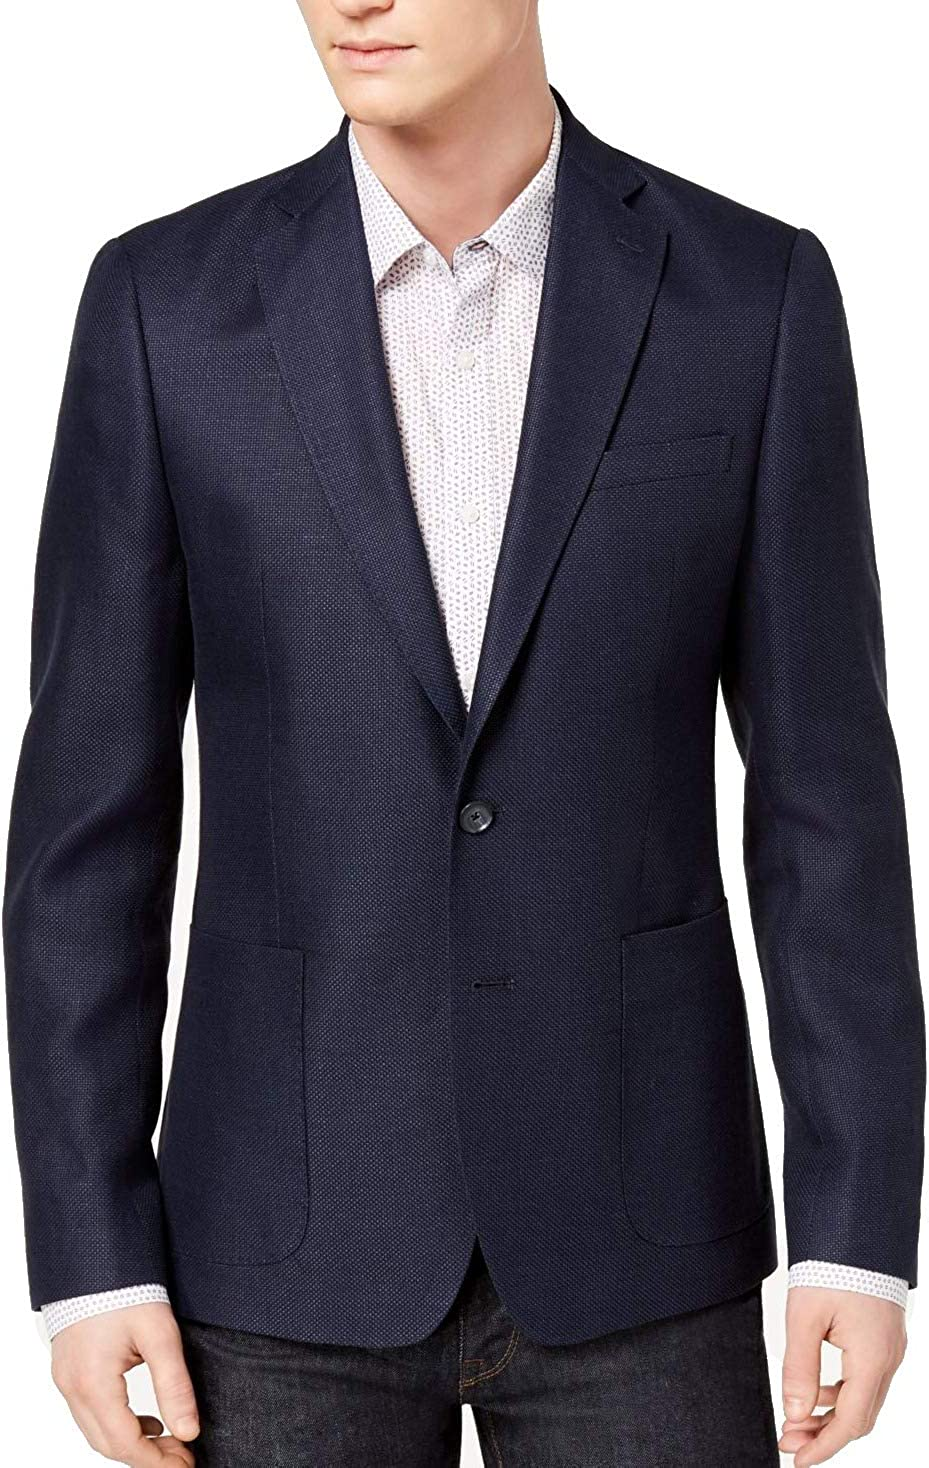 DKNY Mens Modern-Fit One Button Blazer Jacket